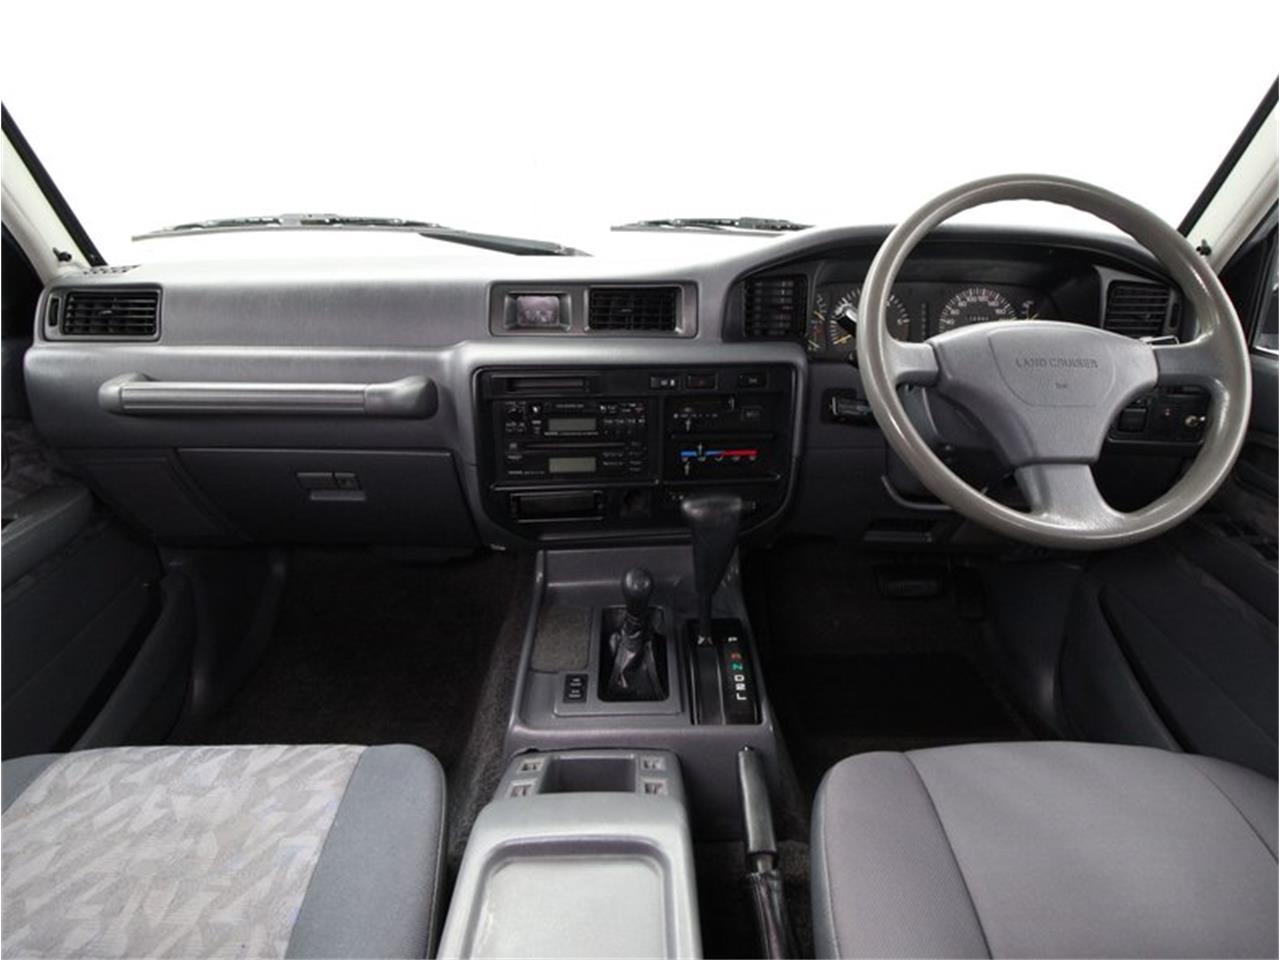 1995 Toyota Land Cruiser FJ (CC-1410772) for sale in Christiansburg, Virginia